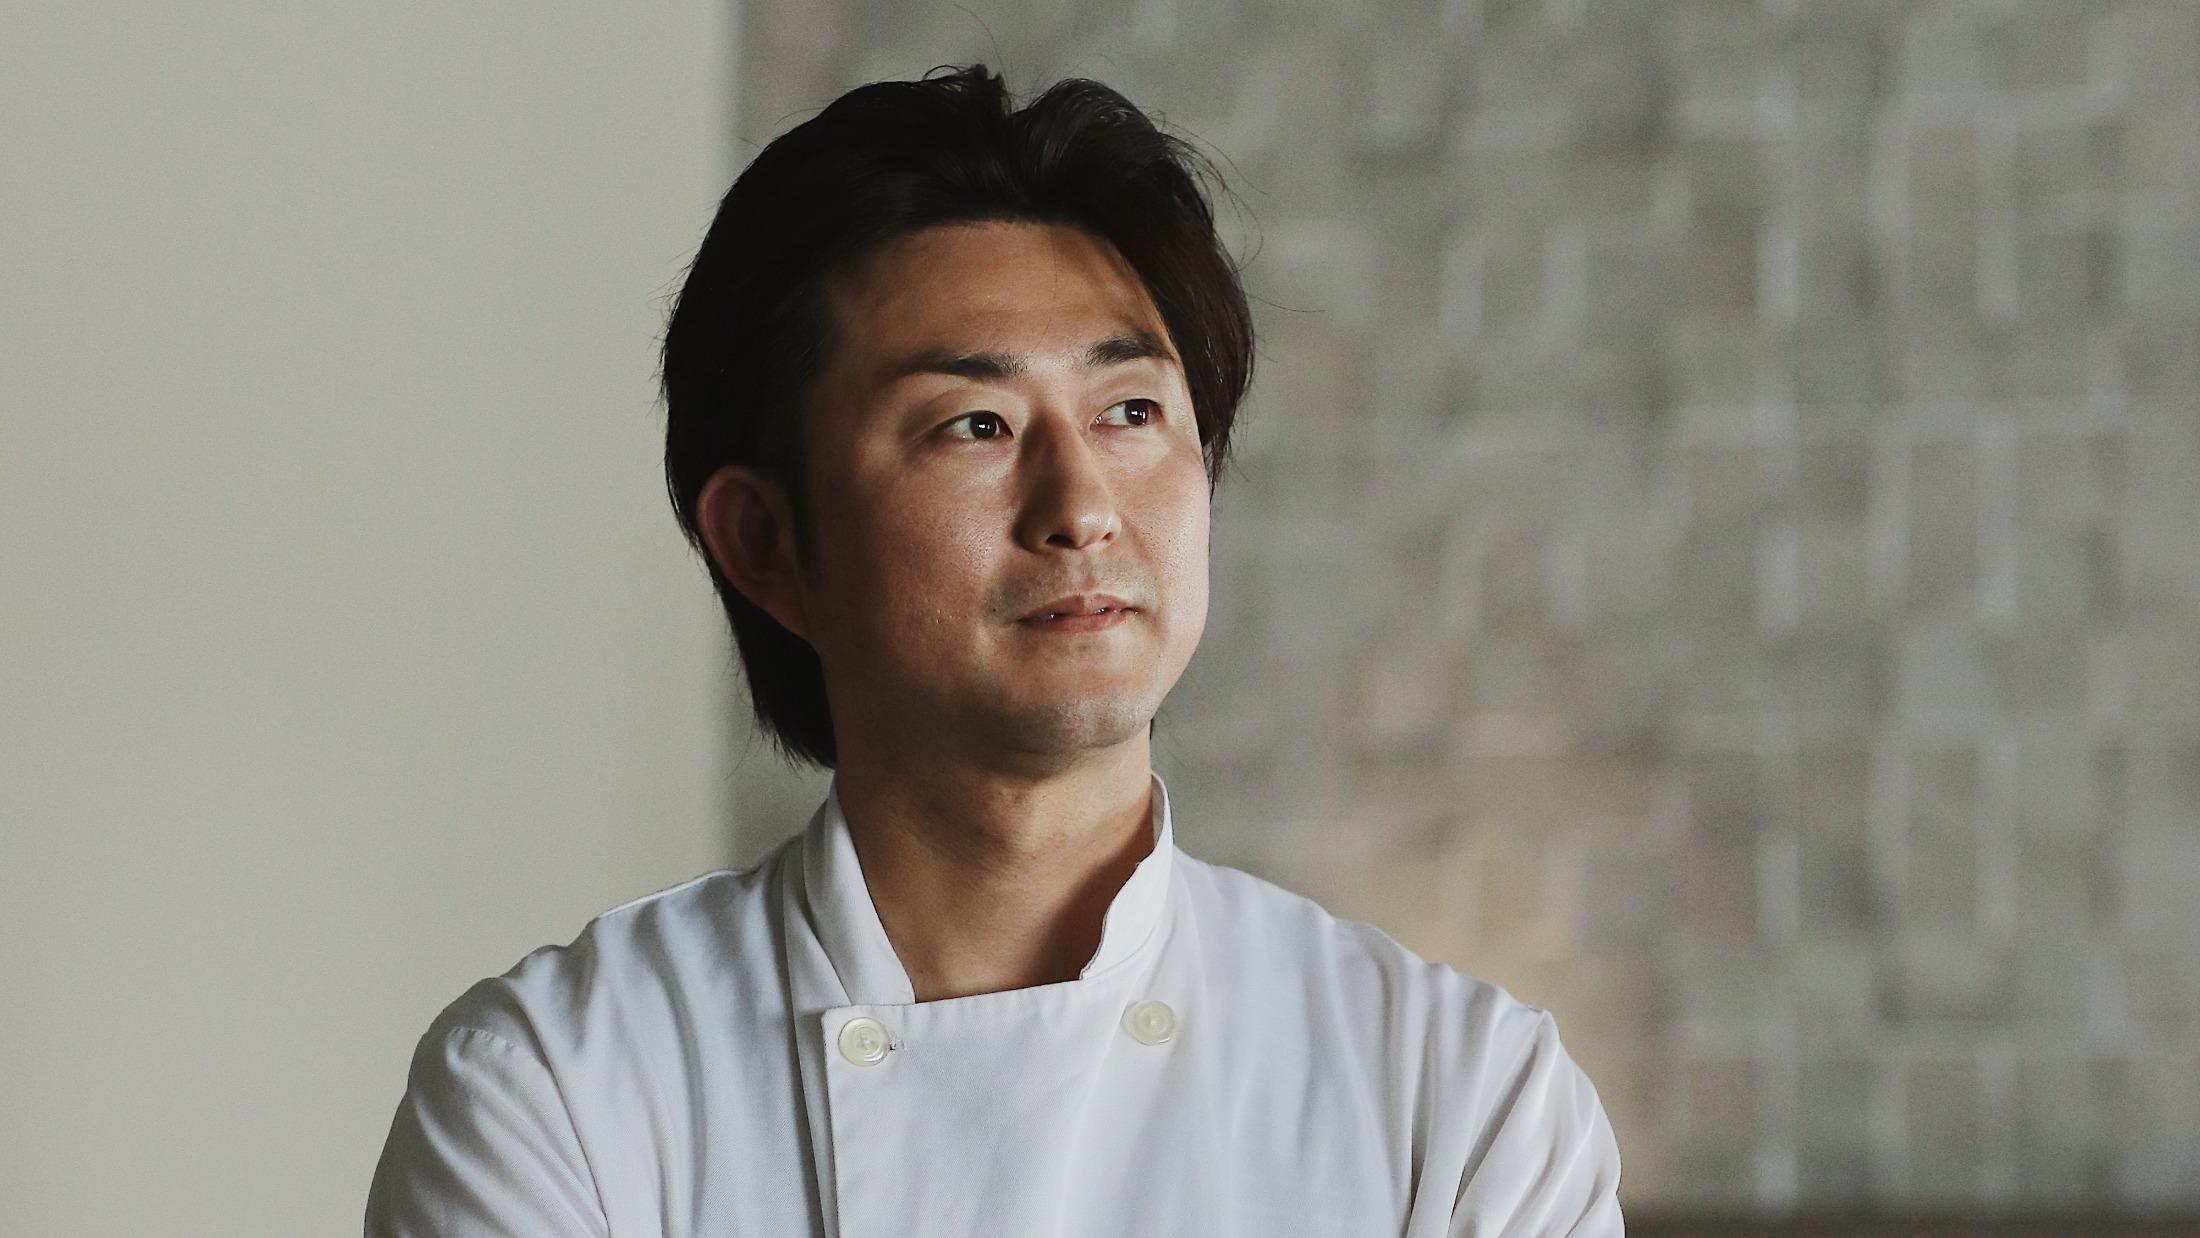 Masahiro Omori